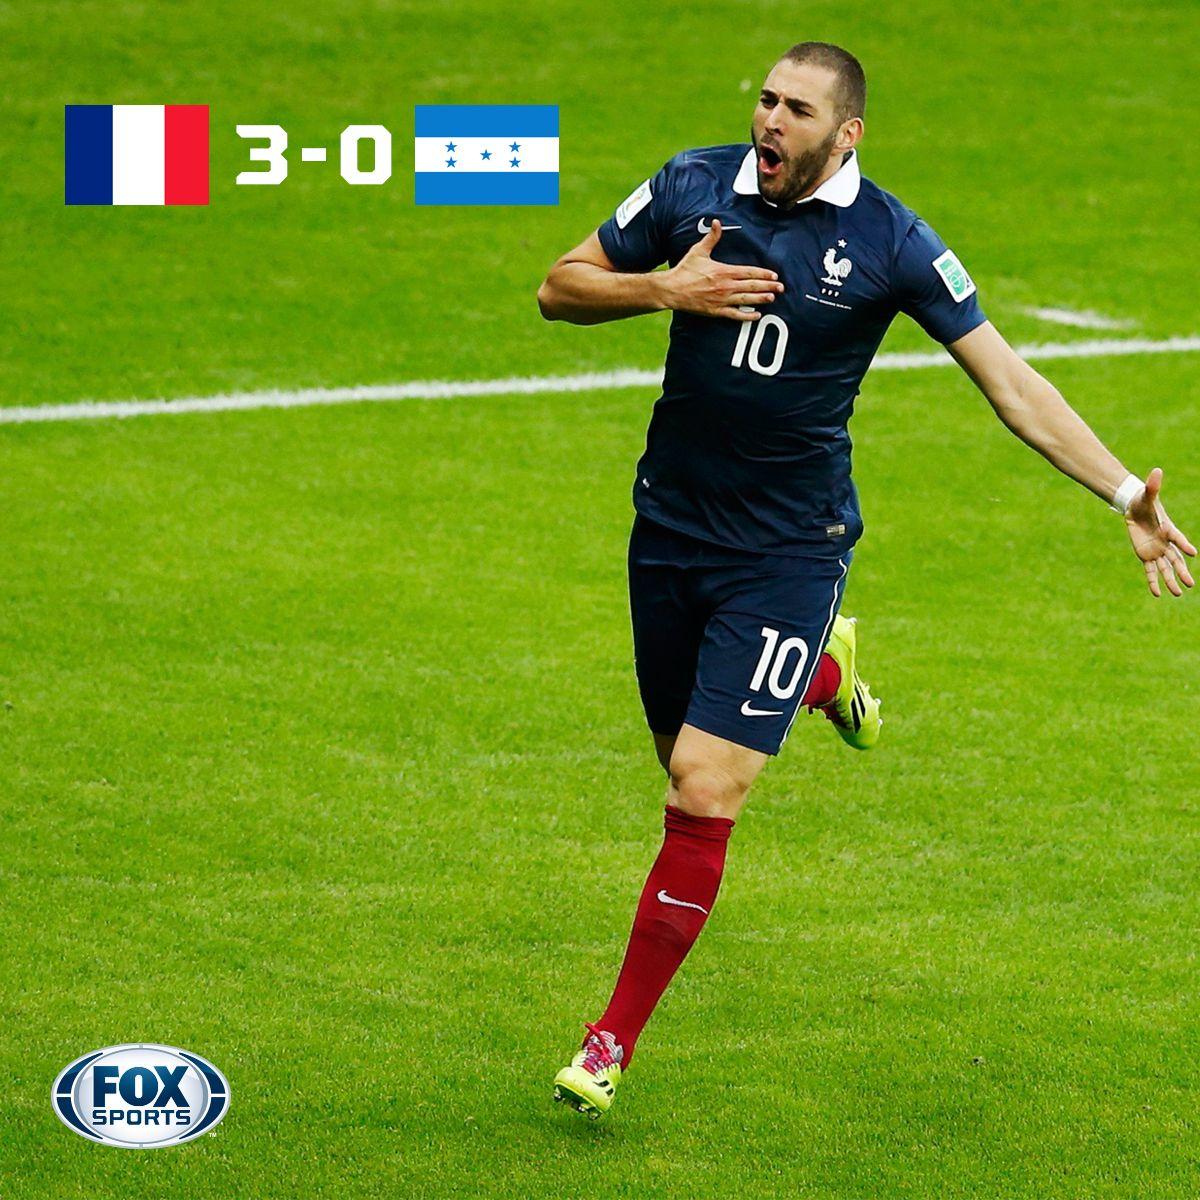 2014 World Cup Group E Soccer, Fox sports, Soccer scores